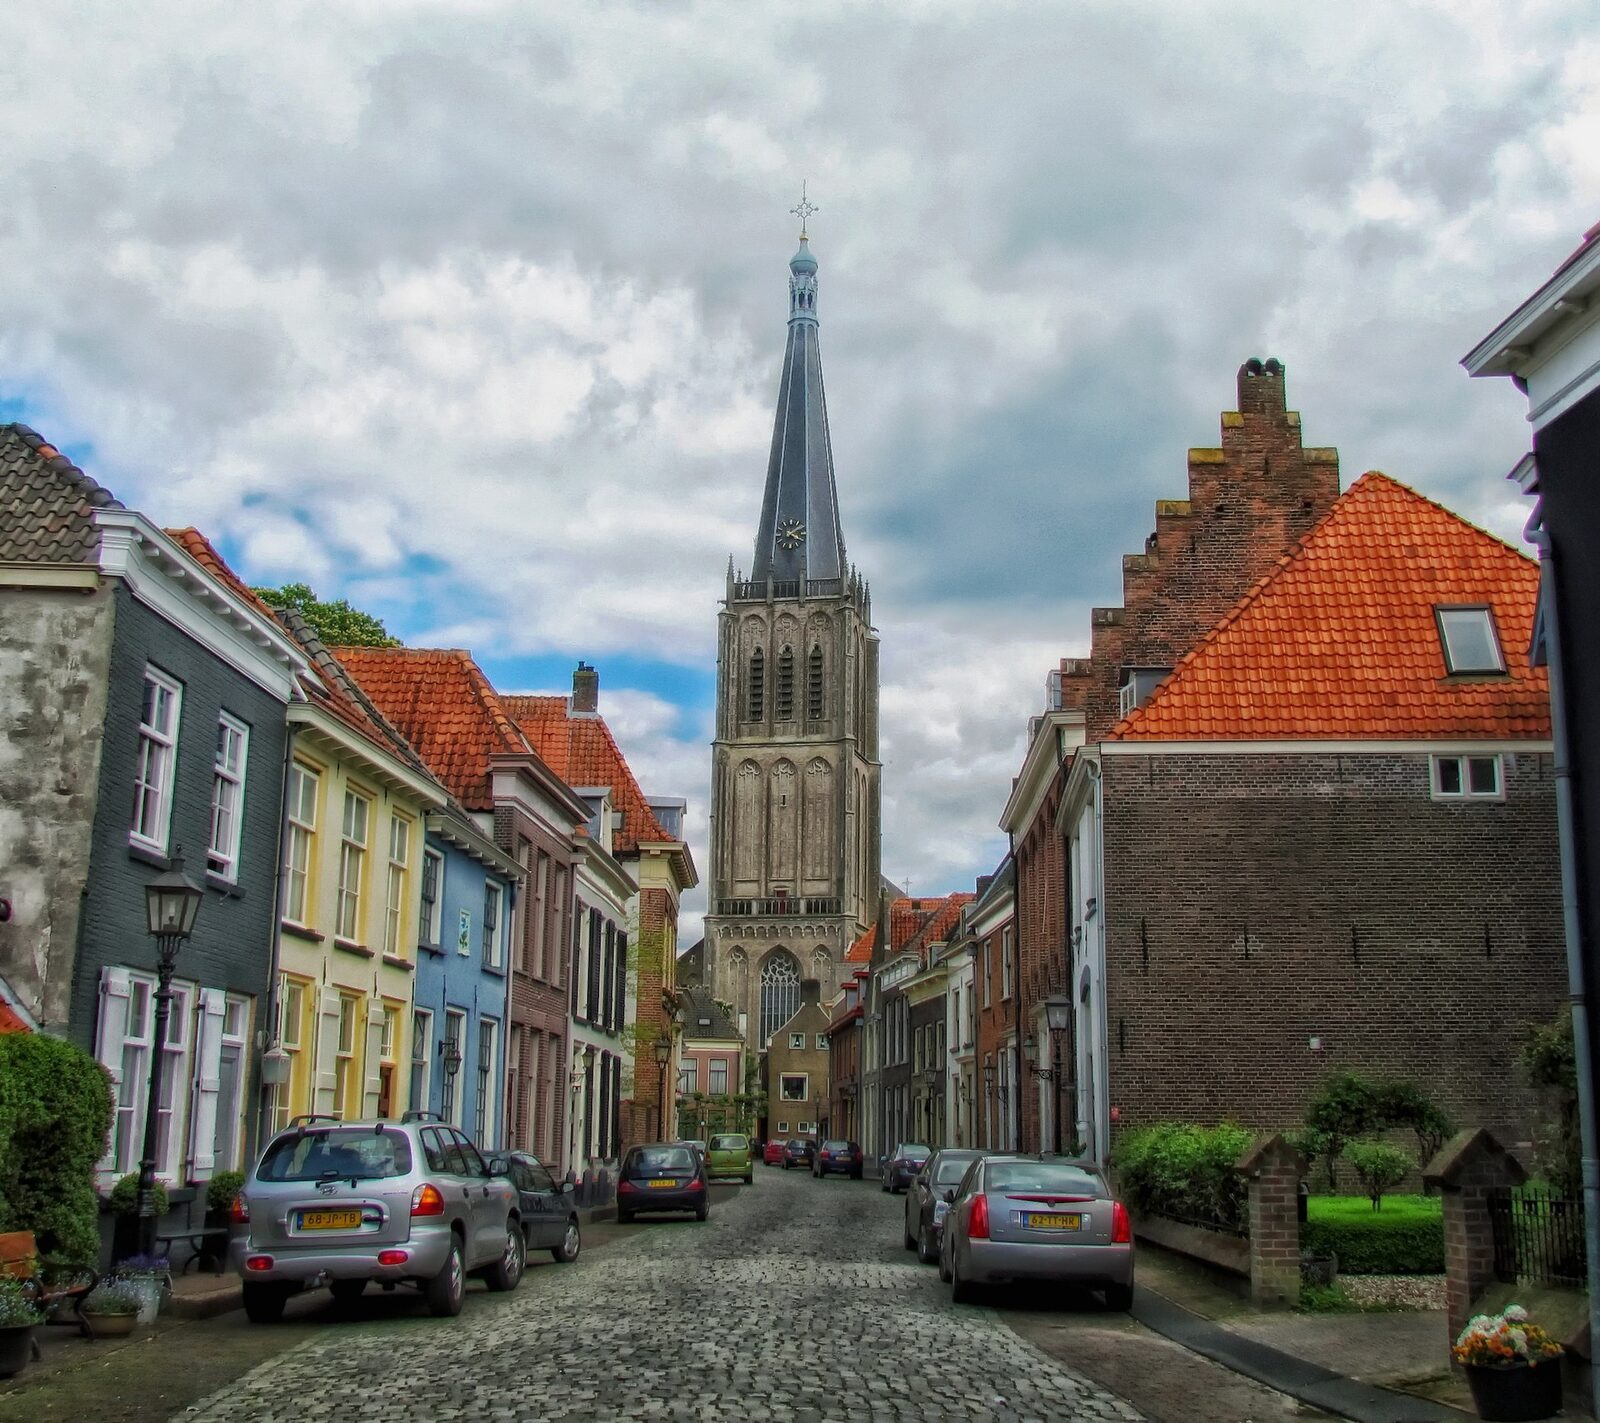 Hanseatic town of Doesburg